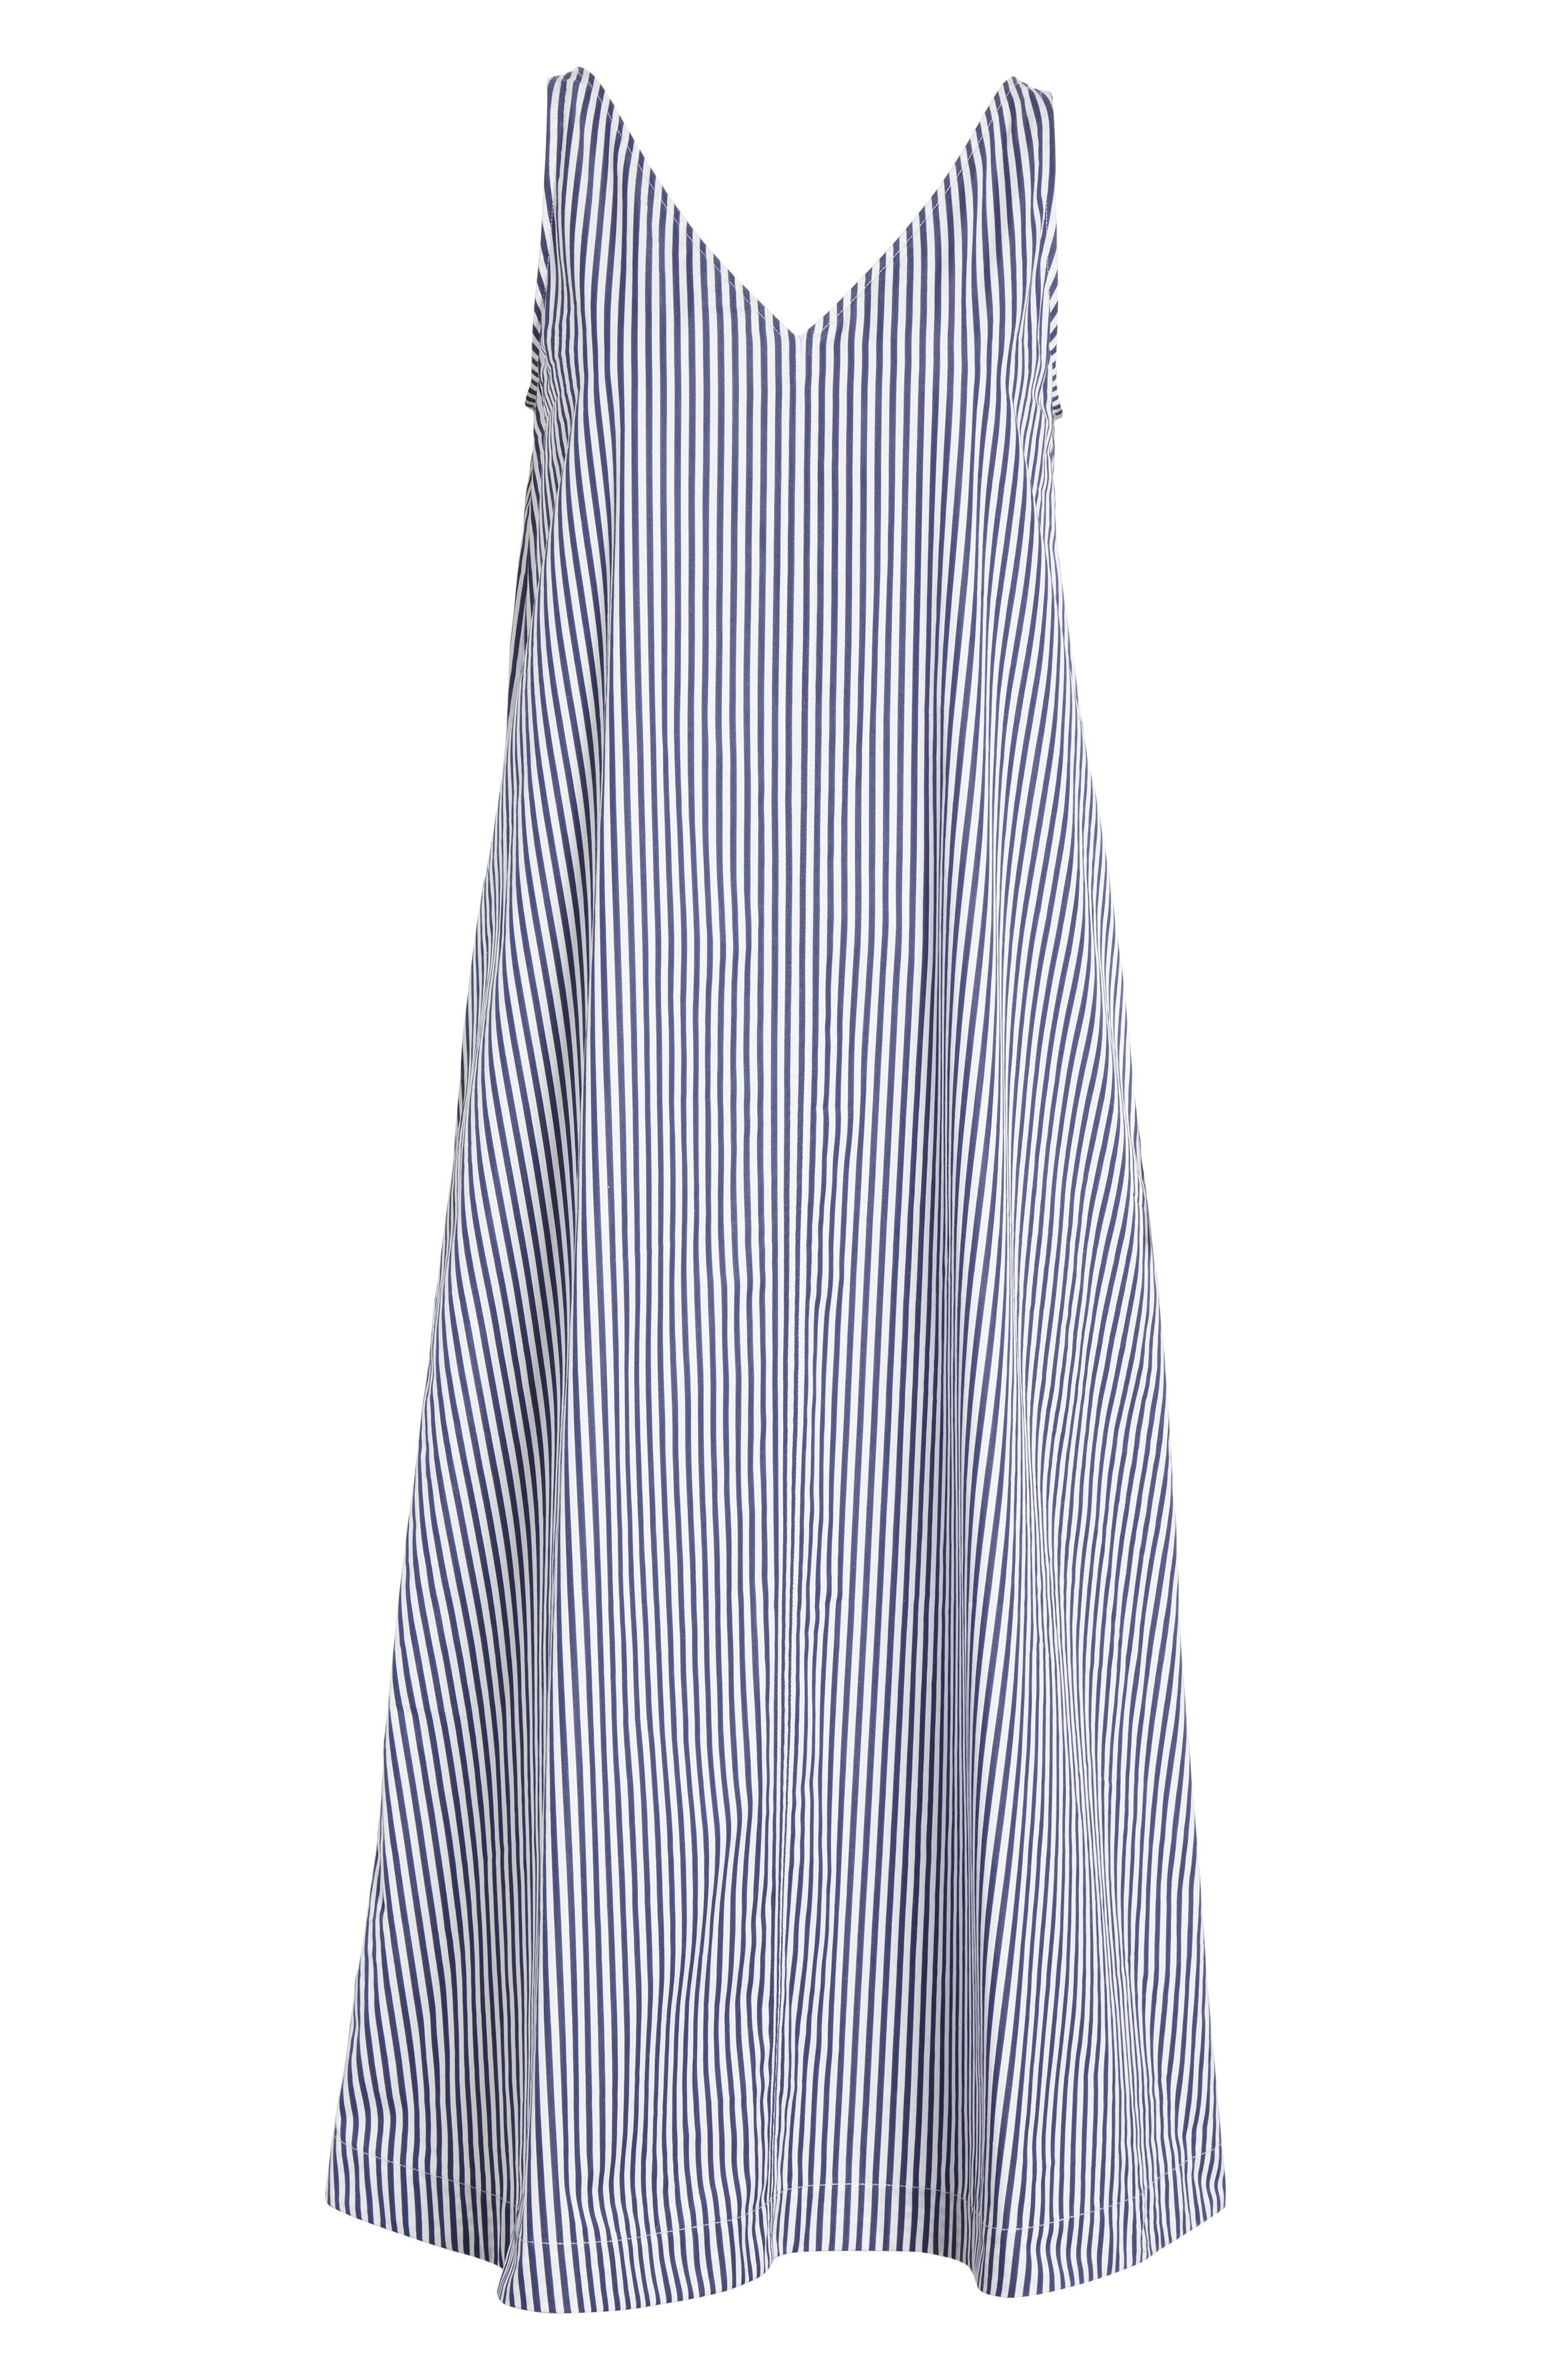 Davey Candy Stripe Shift Dress,                             Alternate thumbnail 6, color,                             456